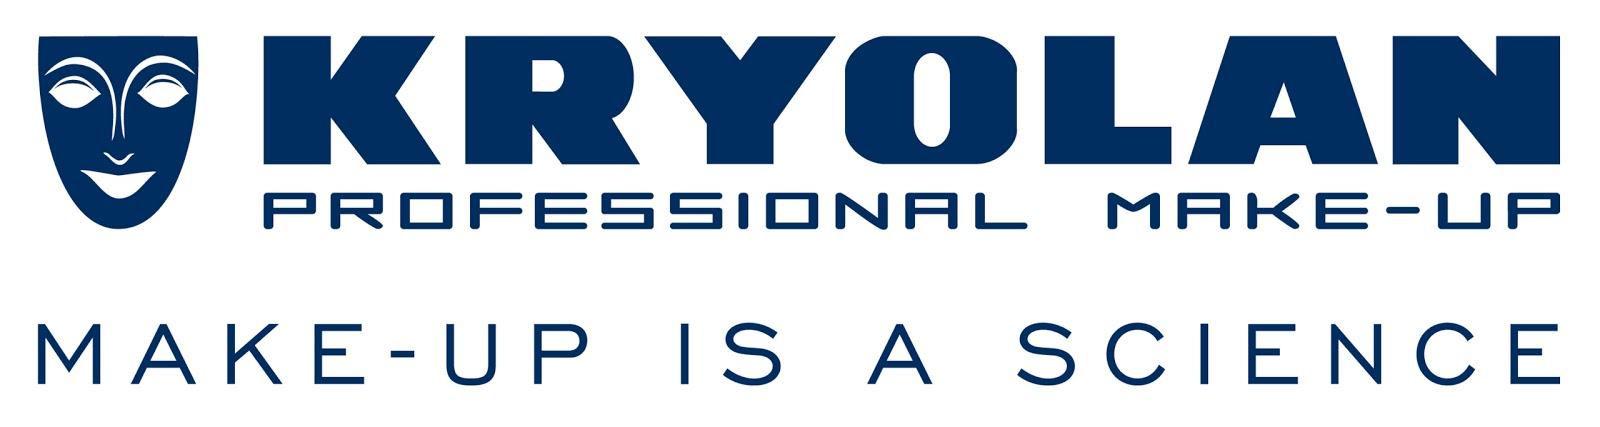 Kryolan_logo.jpg